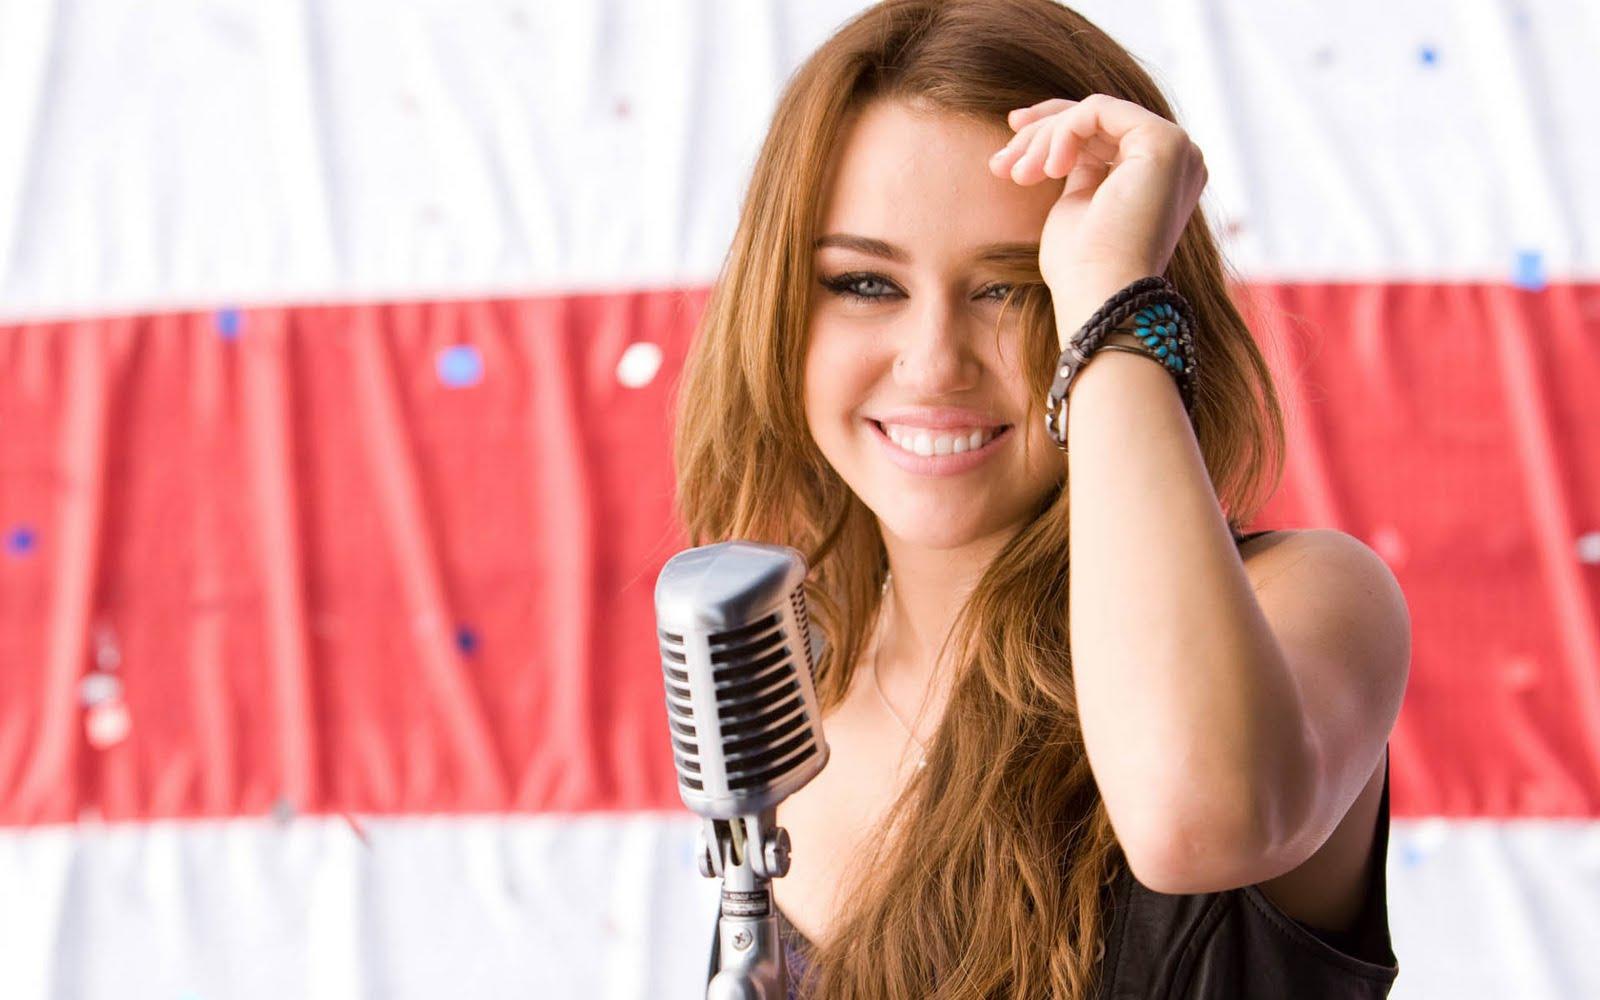 Miley cyrus young photos Miley Cyrus - Actress, Film Actor/Film Actress, Film